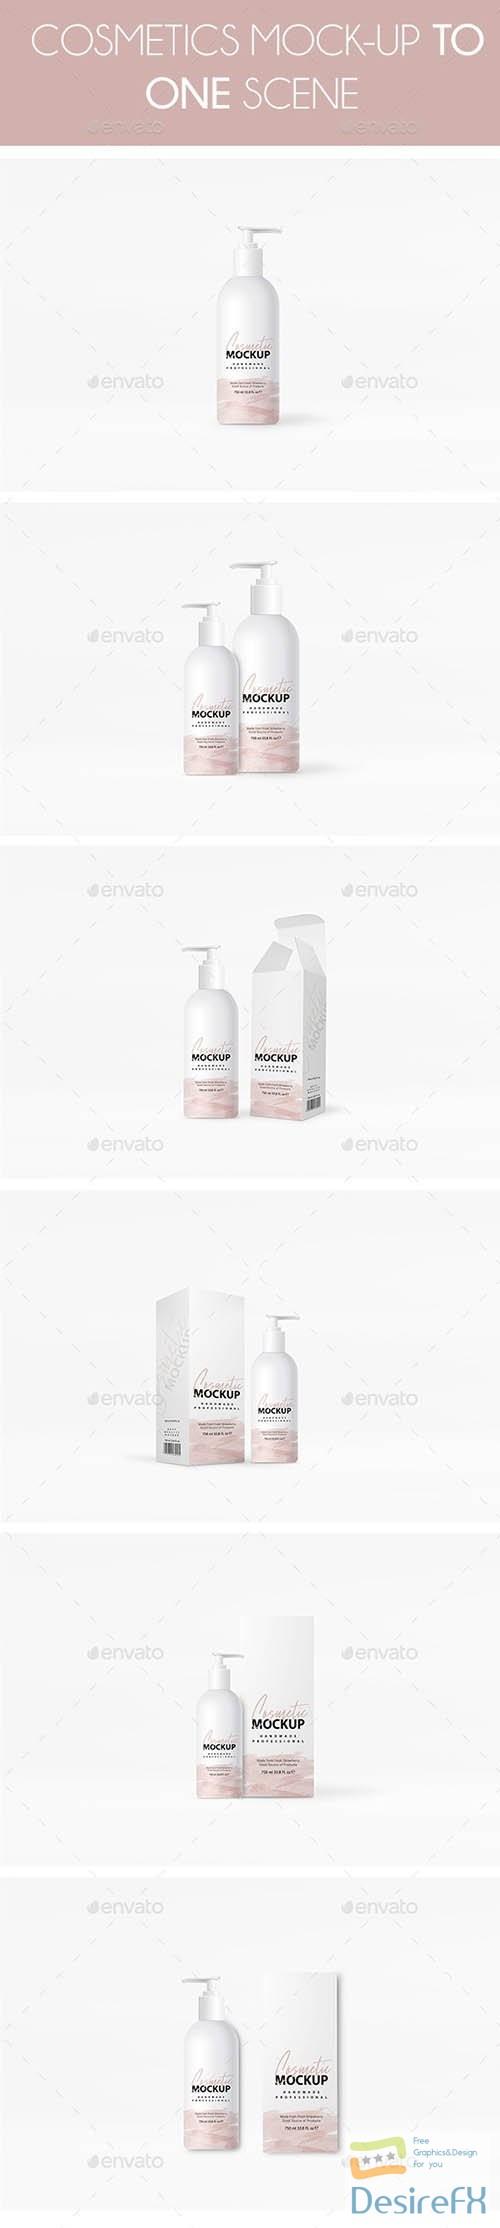 mock-up - Cosmetics Mockup 24268324